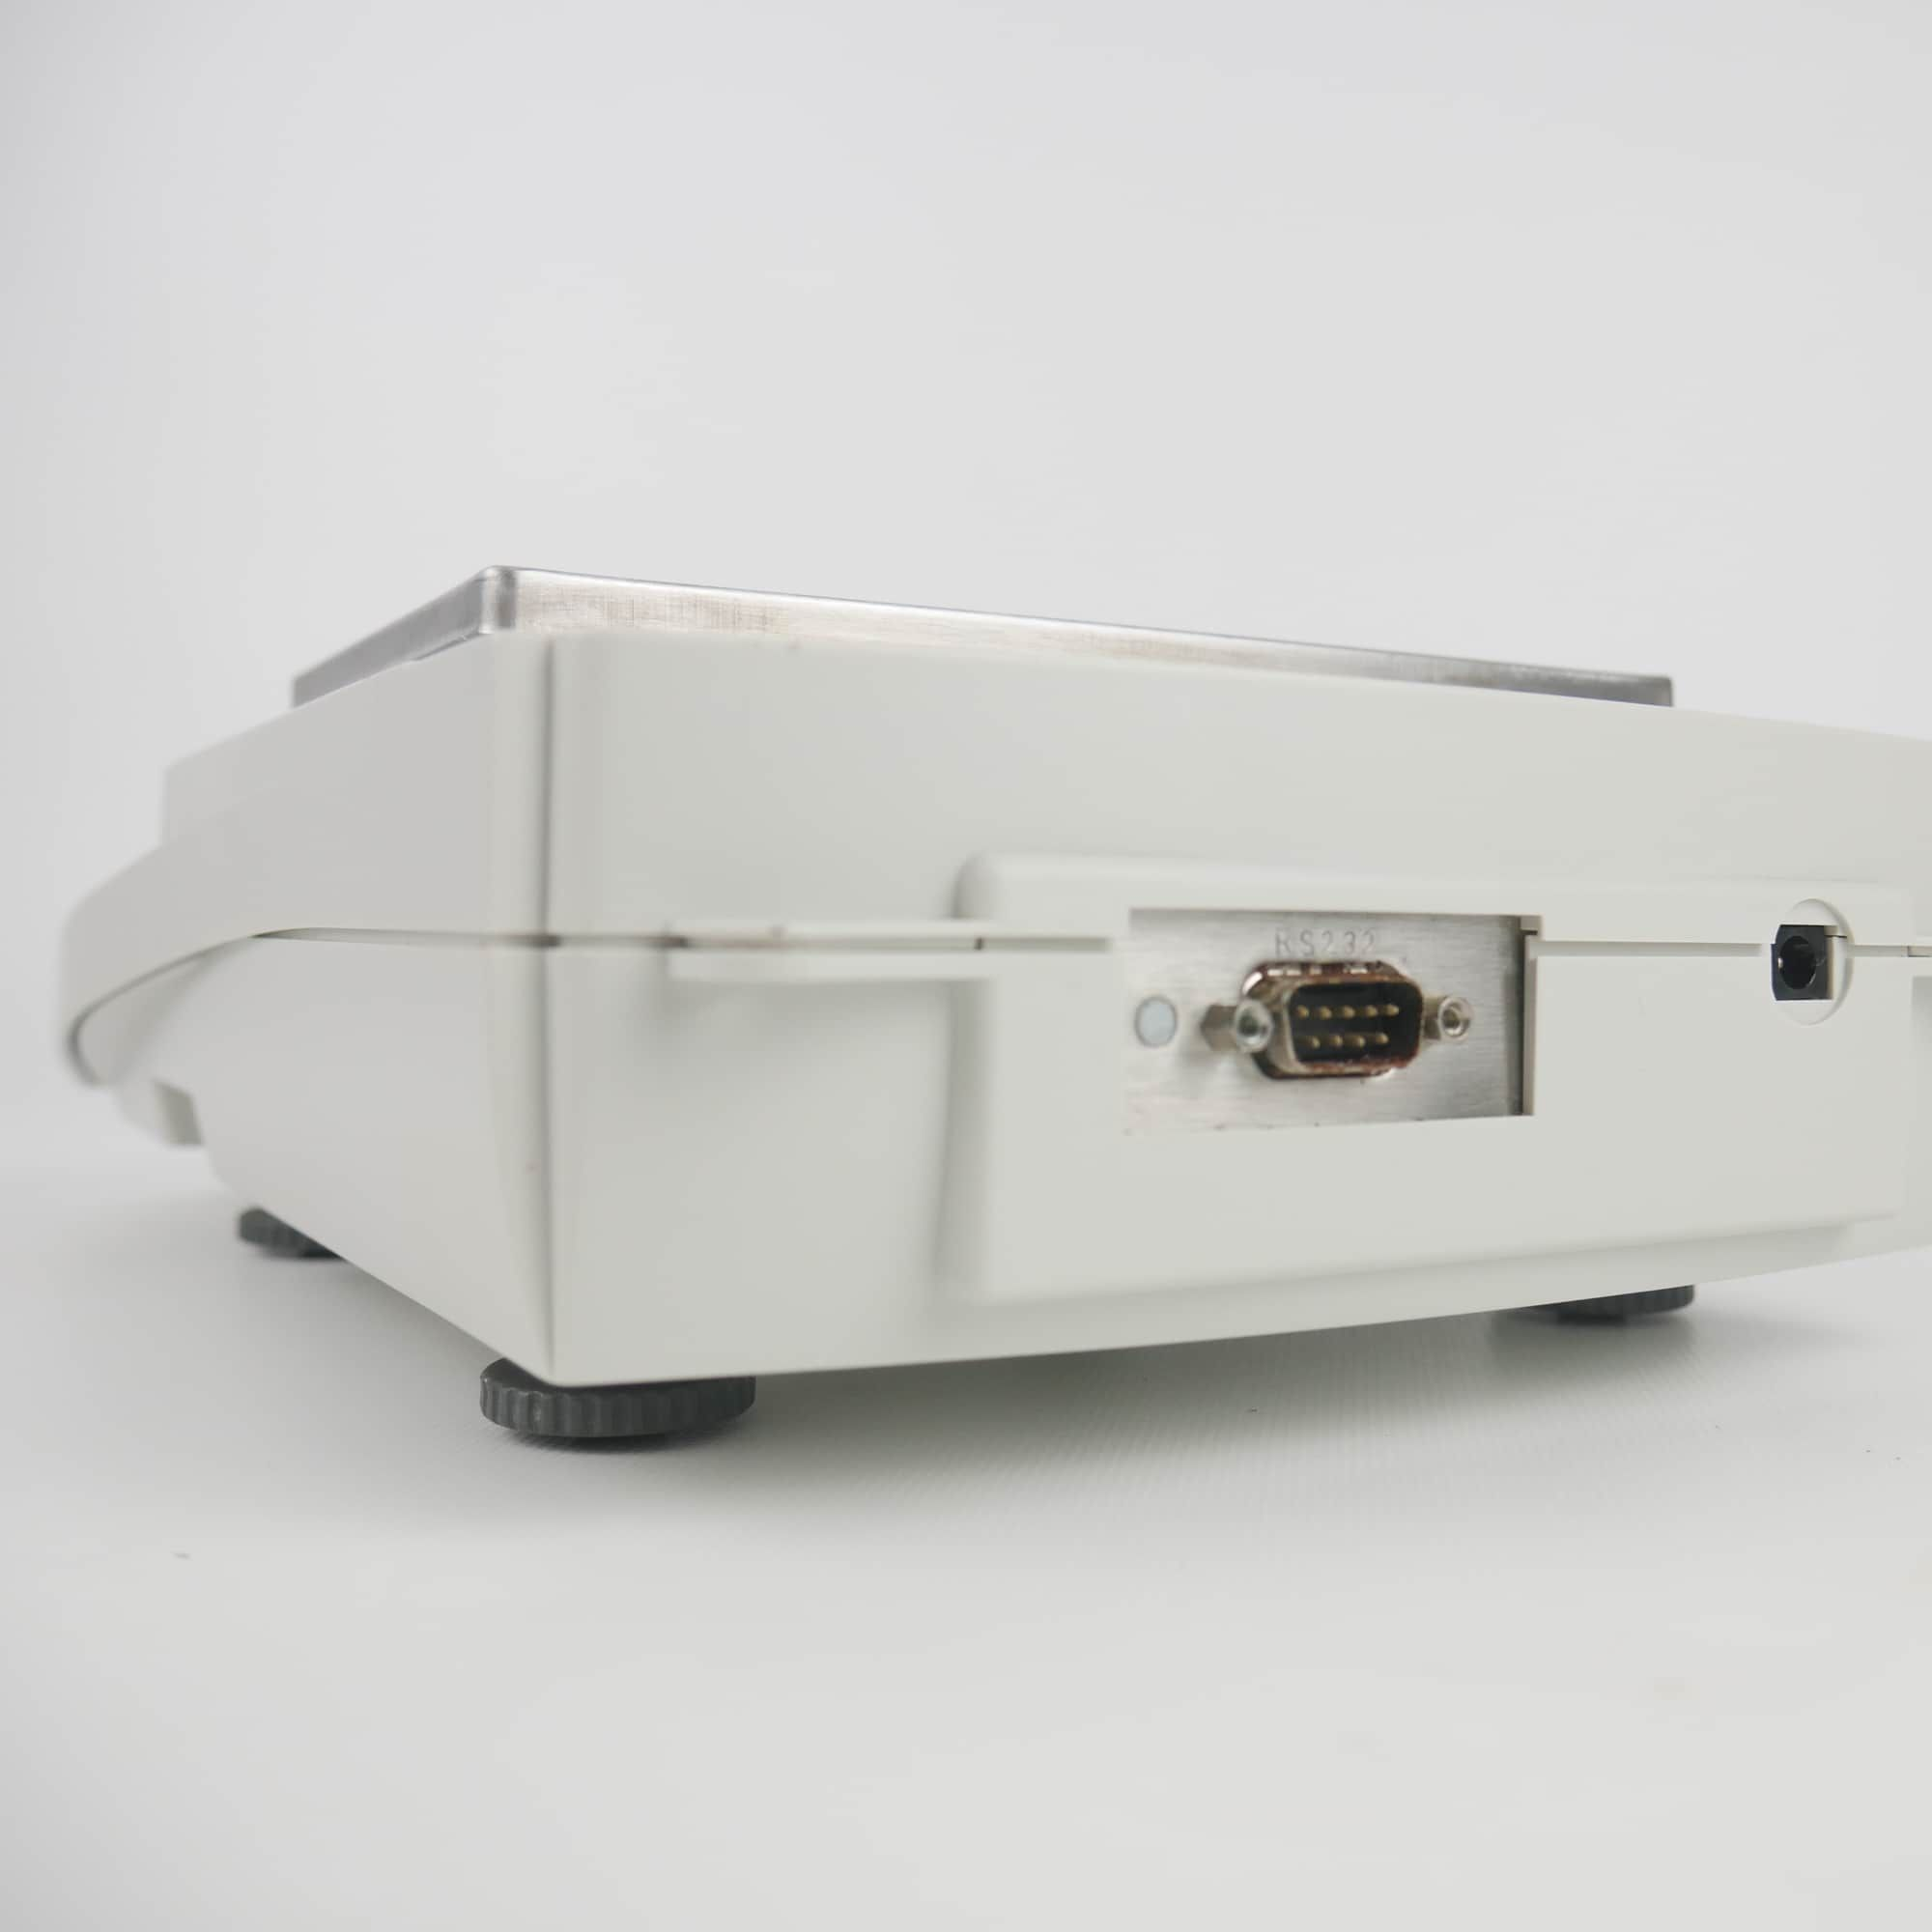 GeneMate APX-4001 Top--Loader Balance